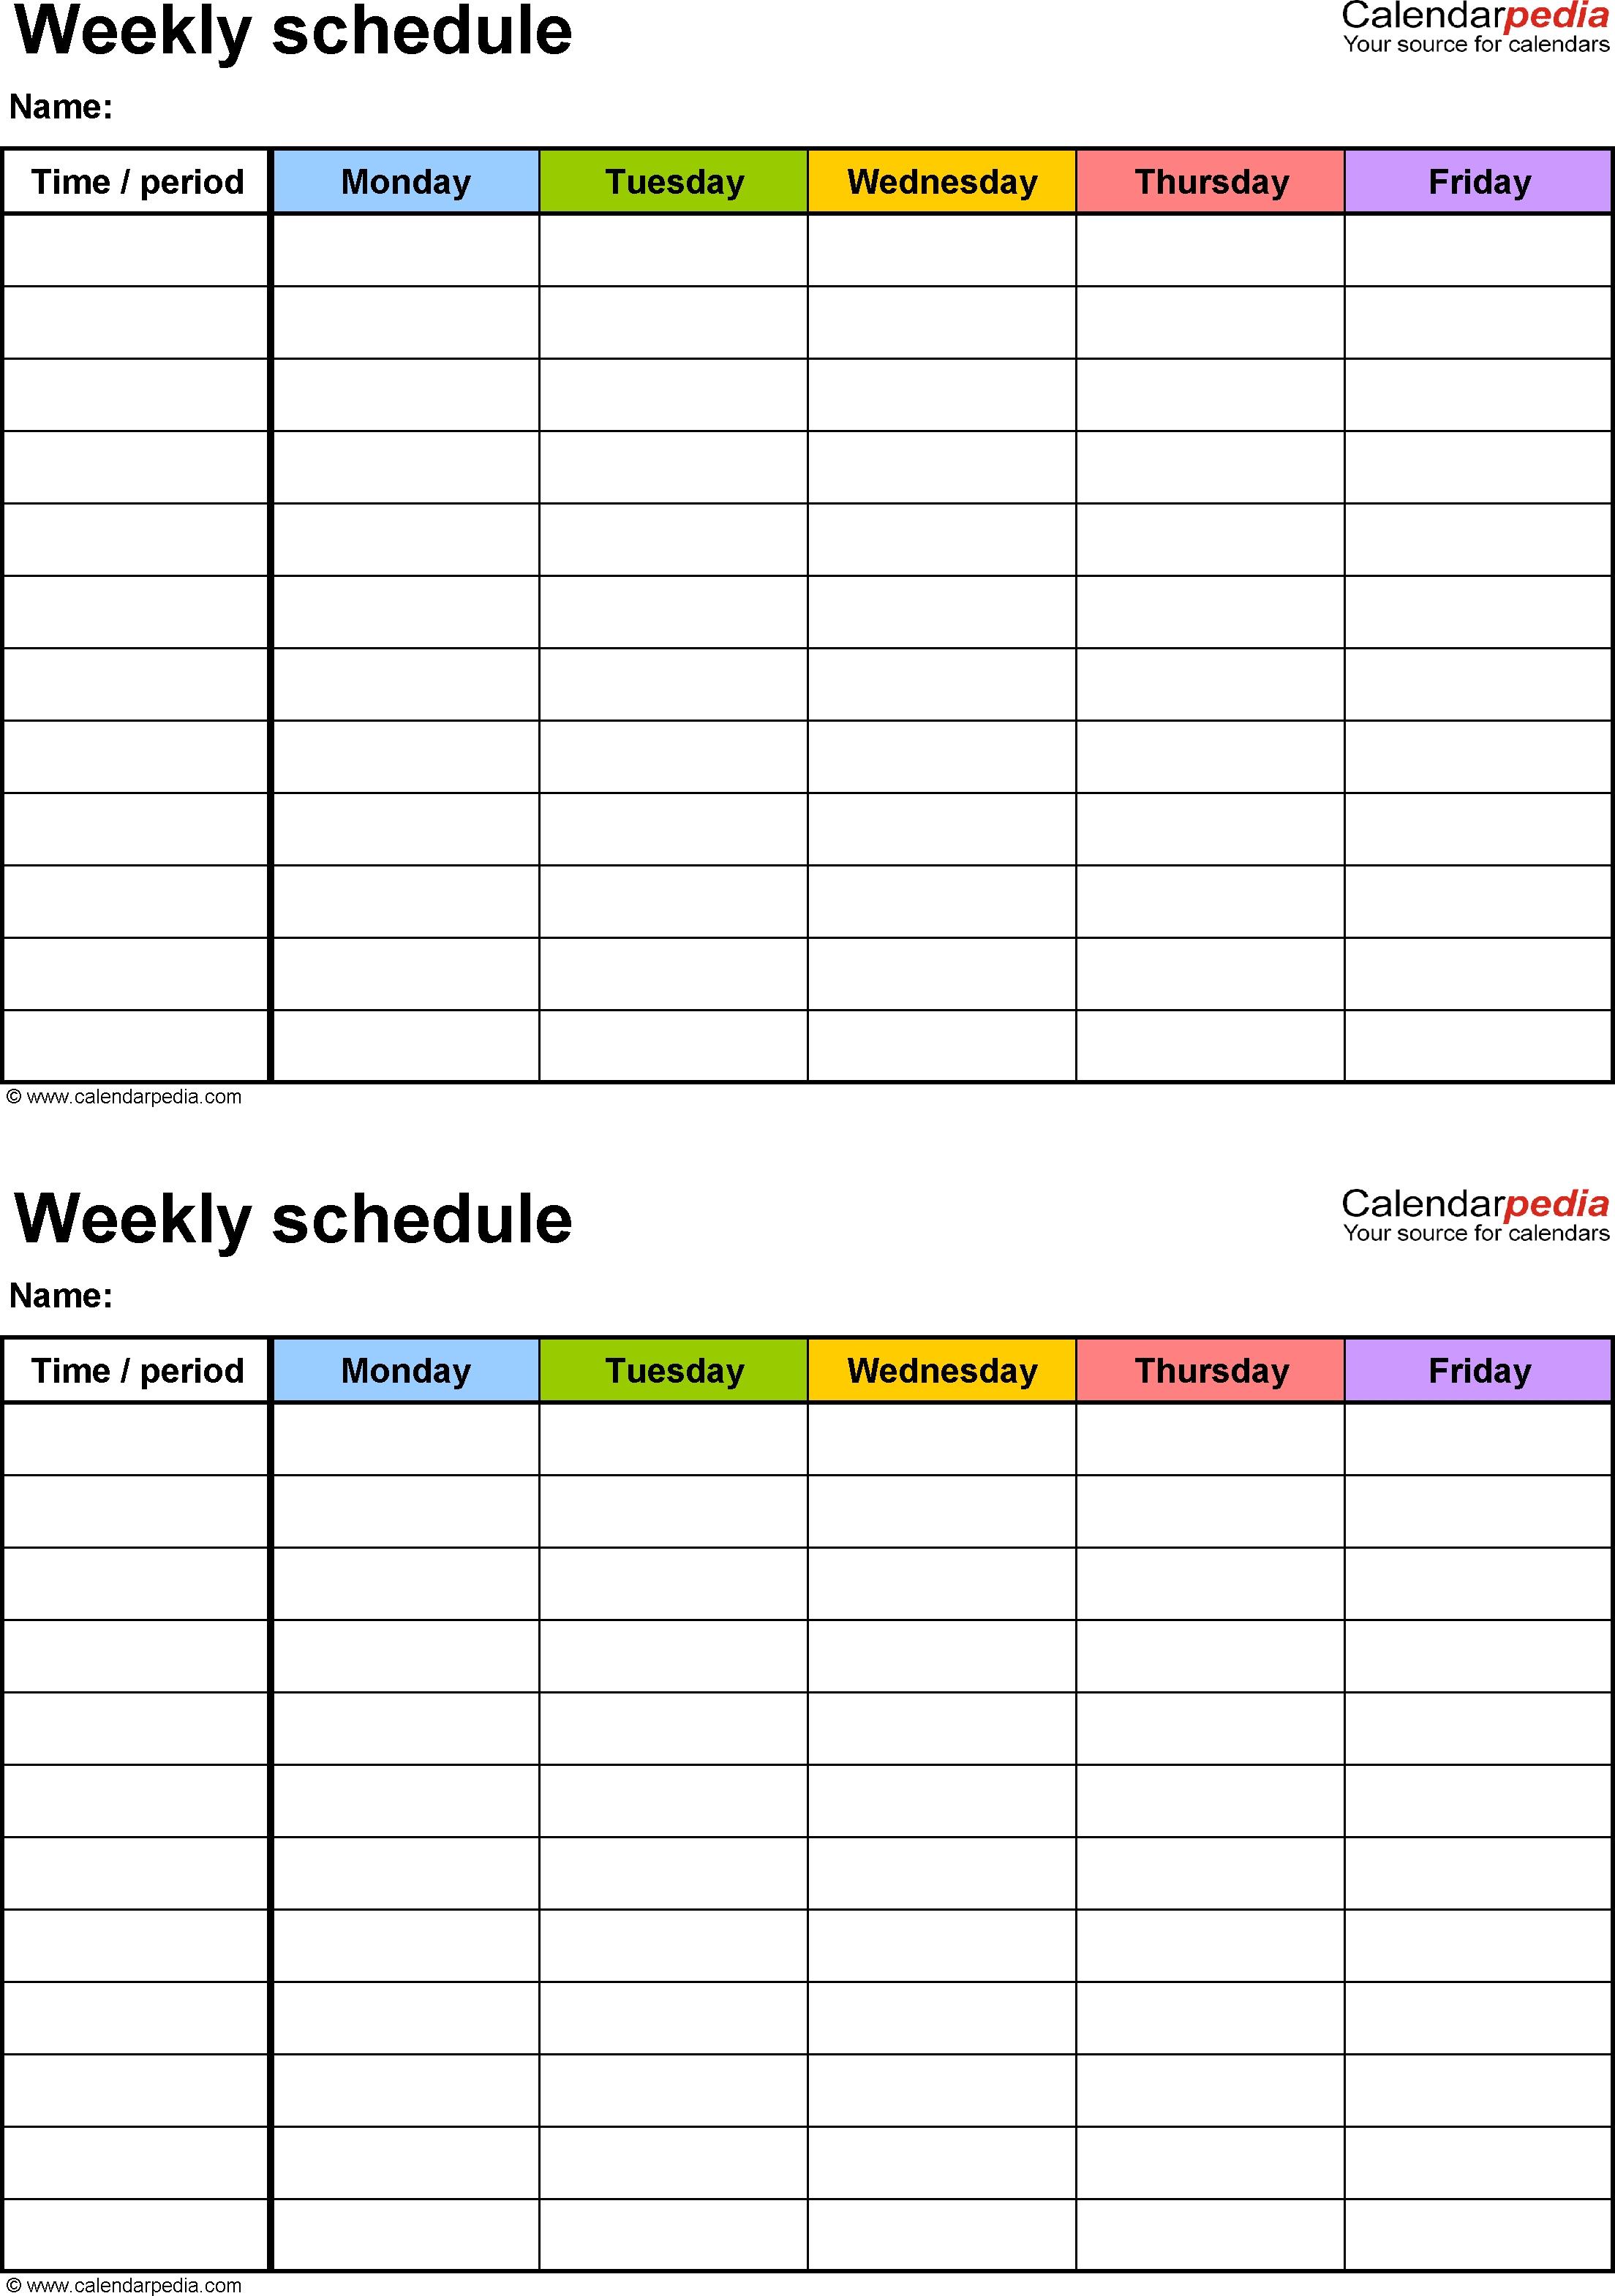 Template Monday To Friday   Calendar Template Printable Monday Friday Calendar Template Word